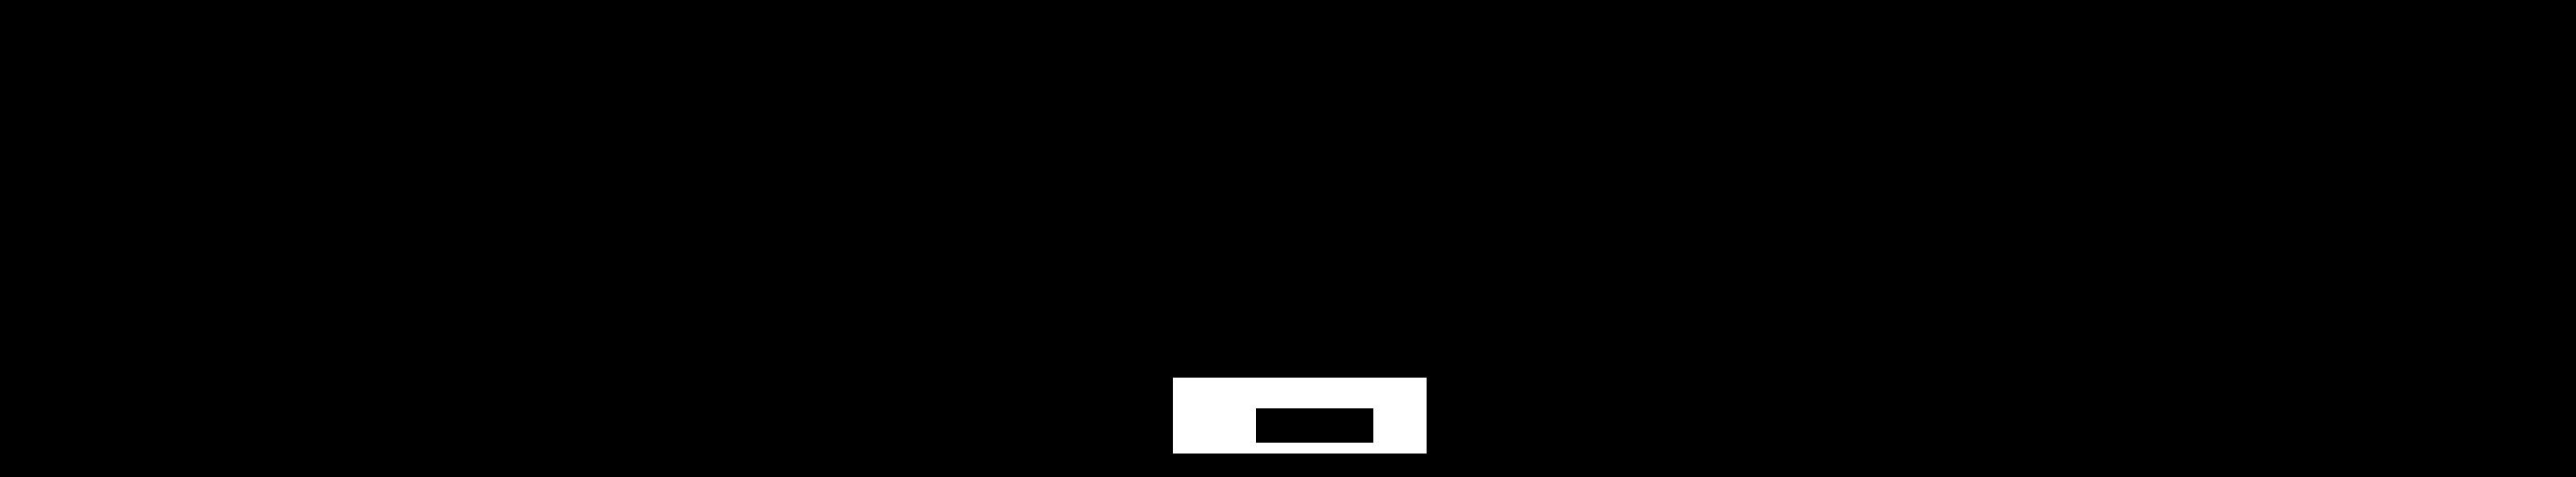 hll142-n-m-f.png